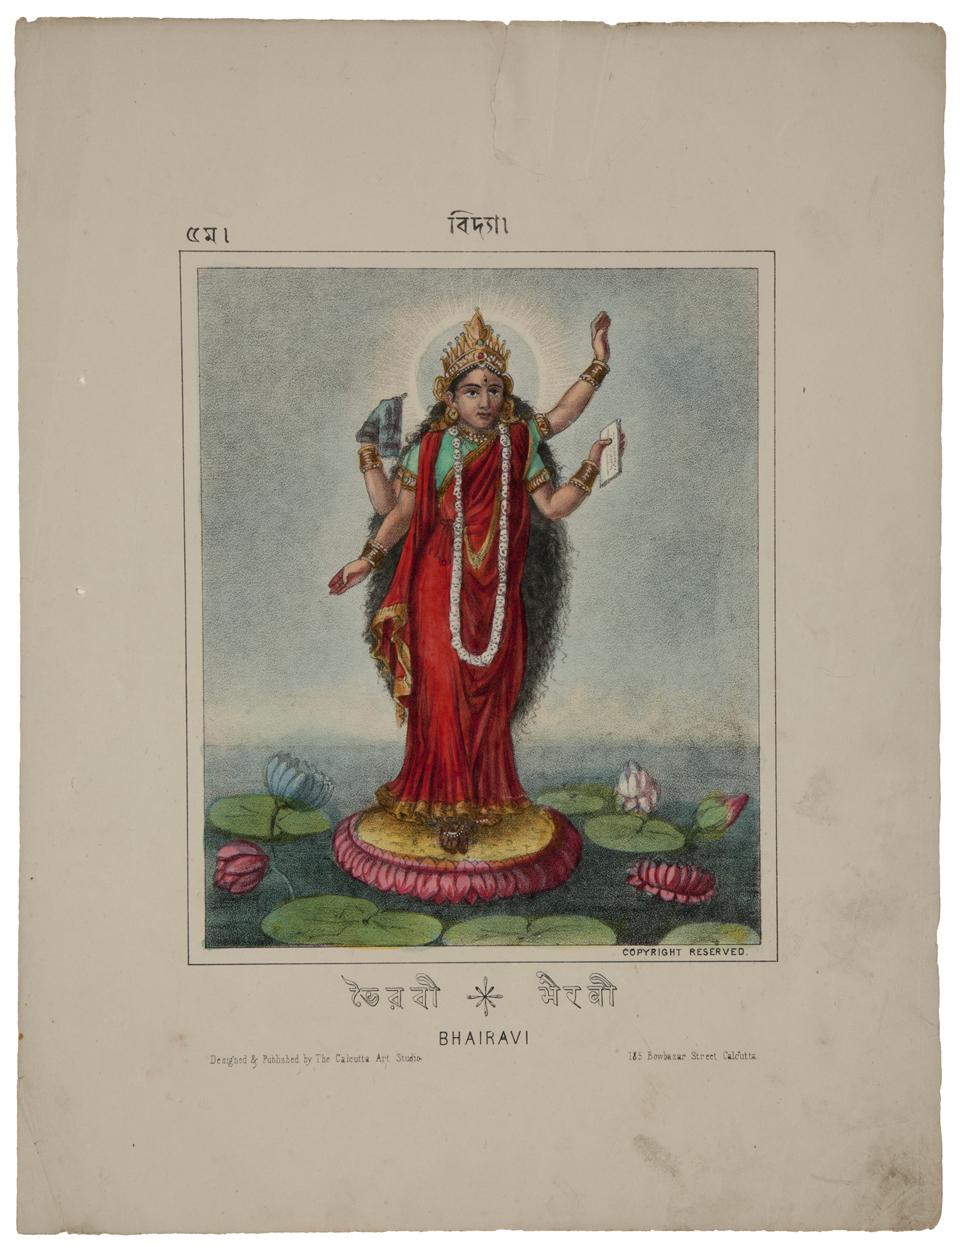 Bhairavi, c. 1880